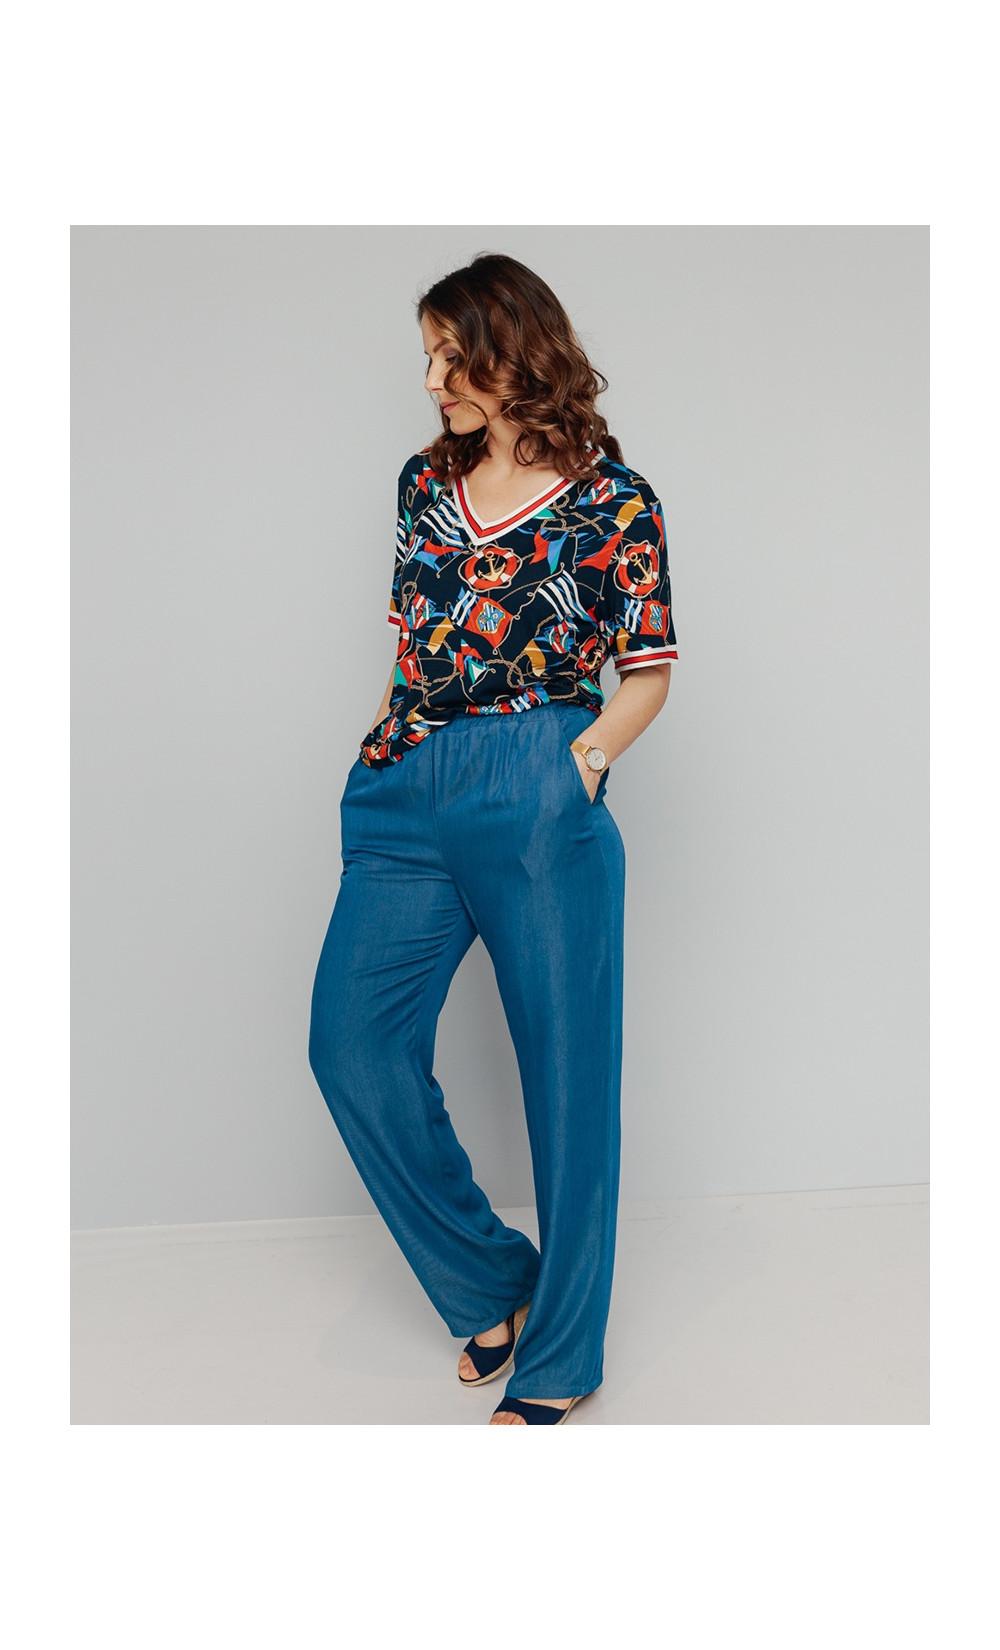 tee-shirt - CANARIE